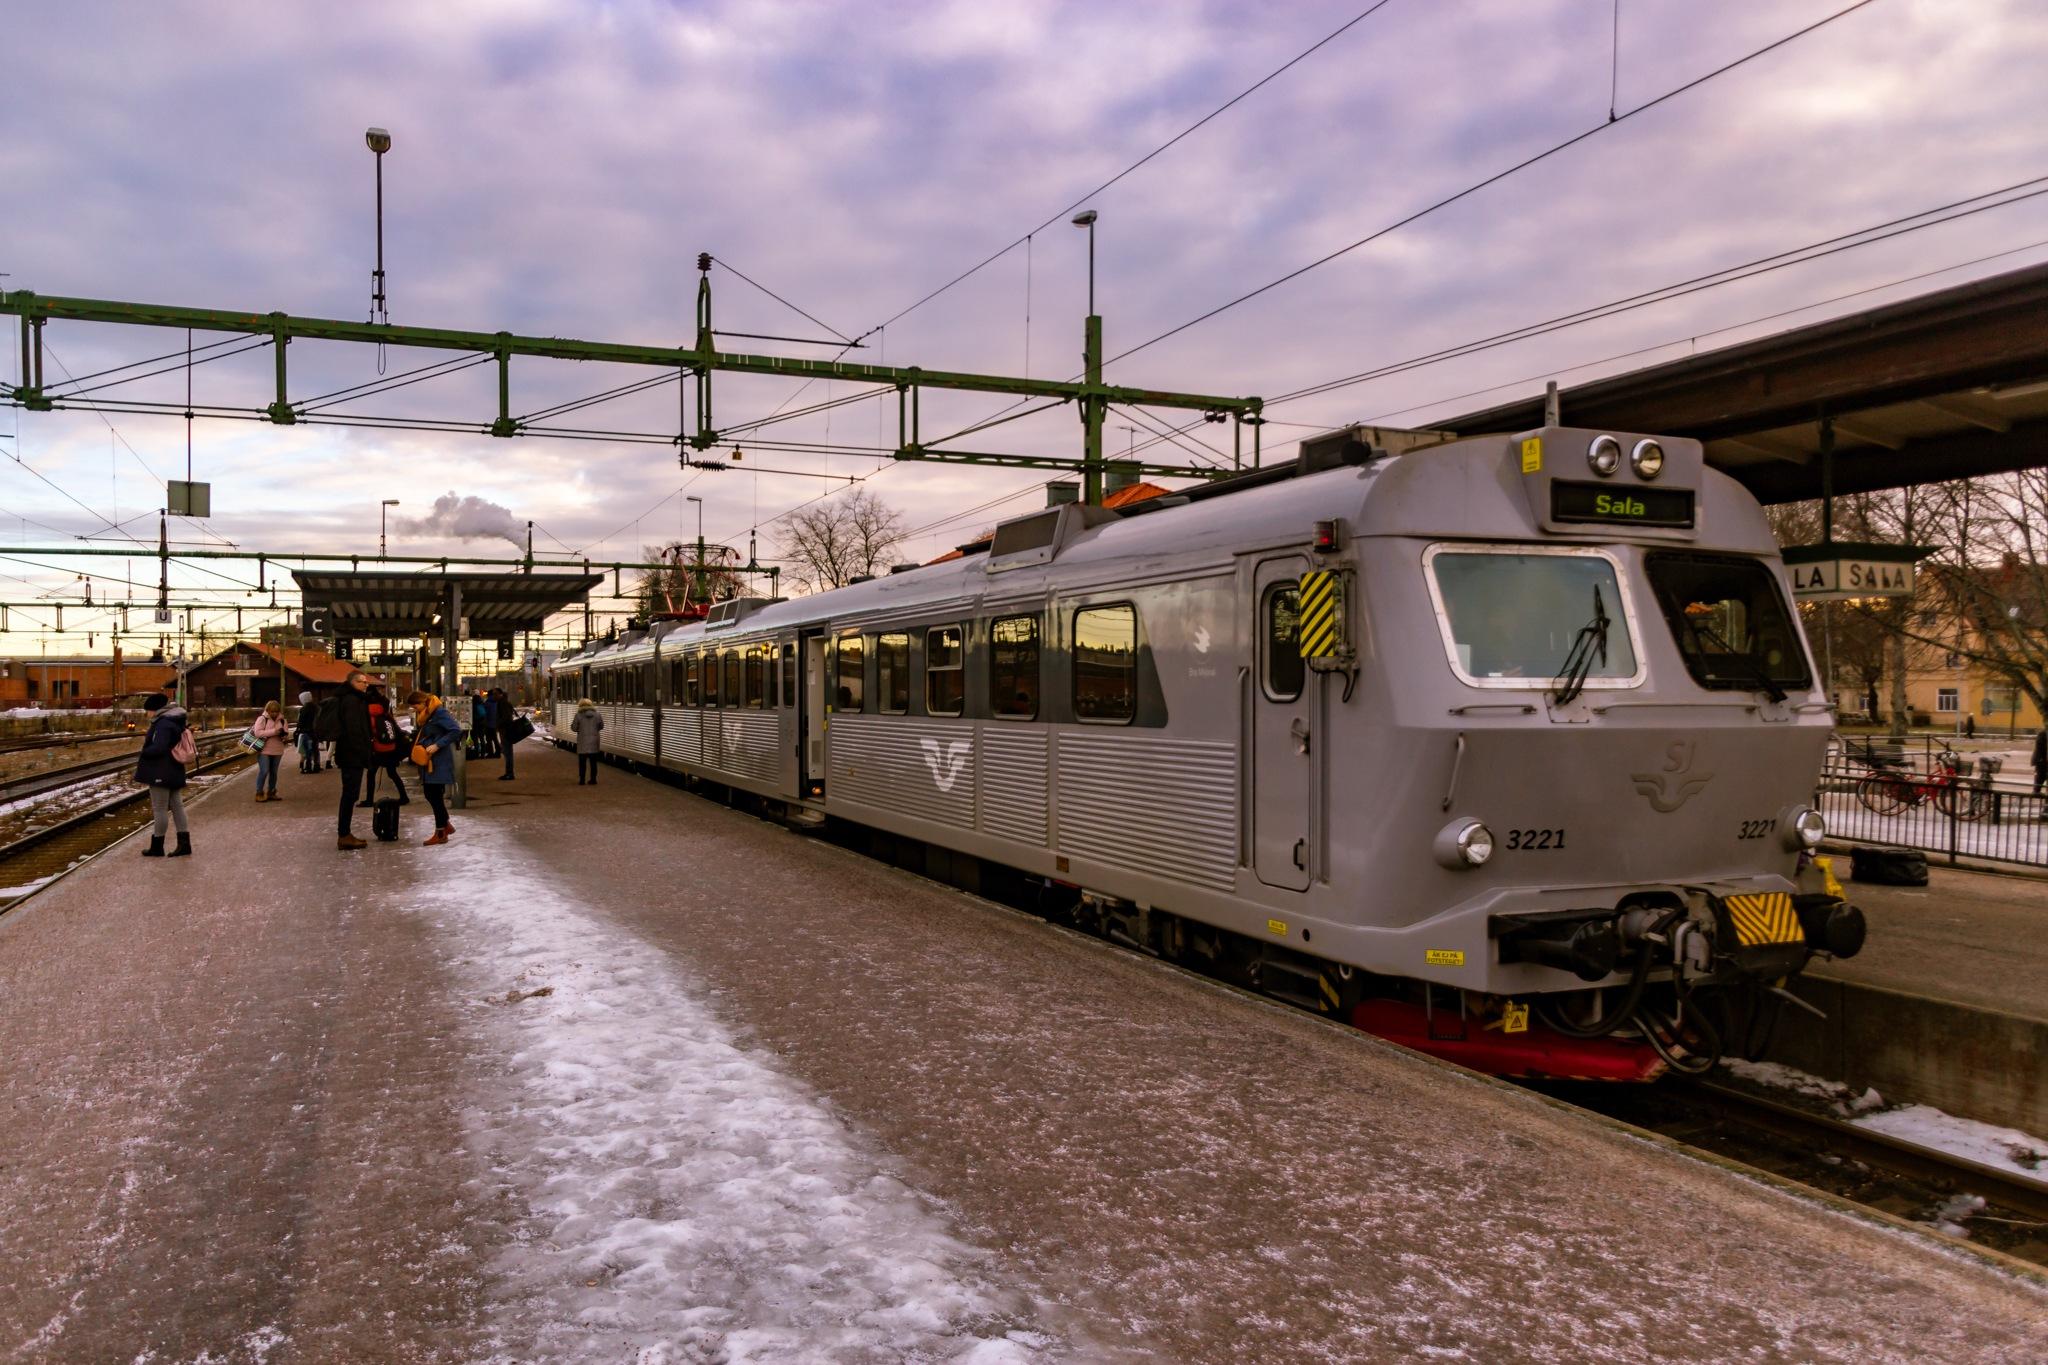 Sala Railway station by Carl Hult